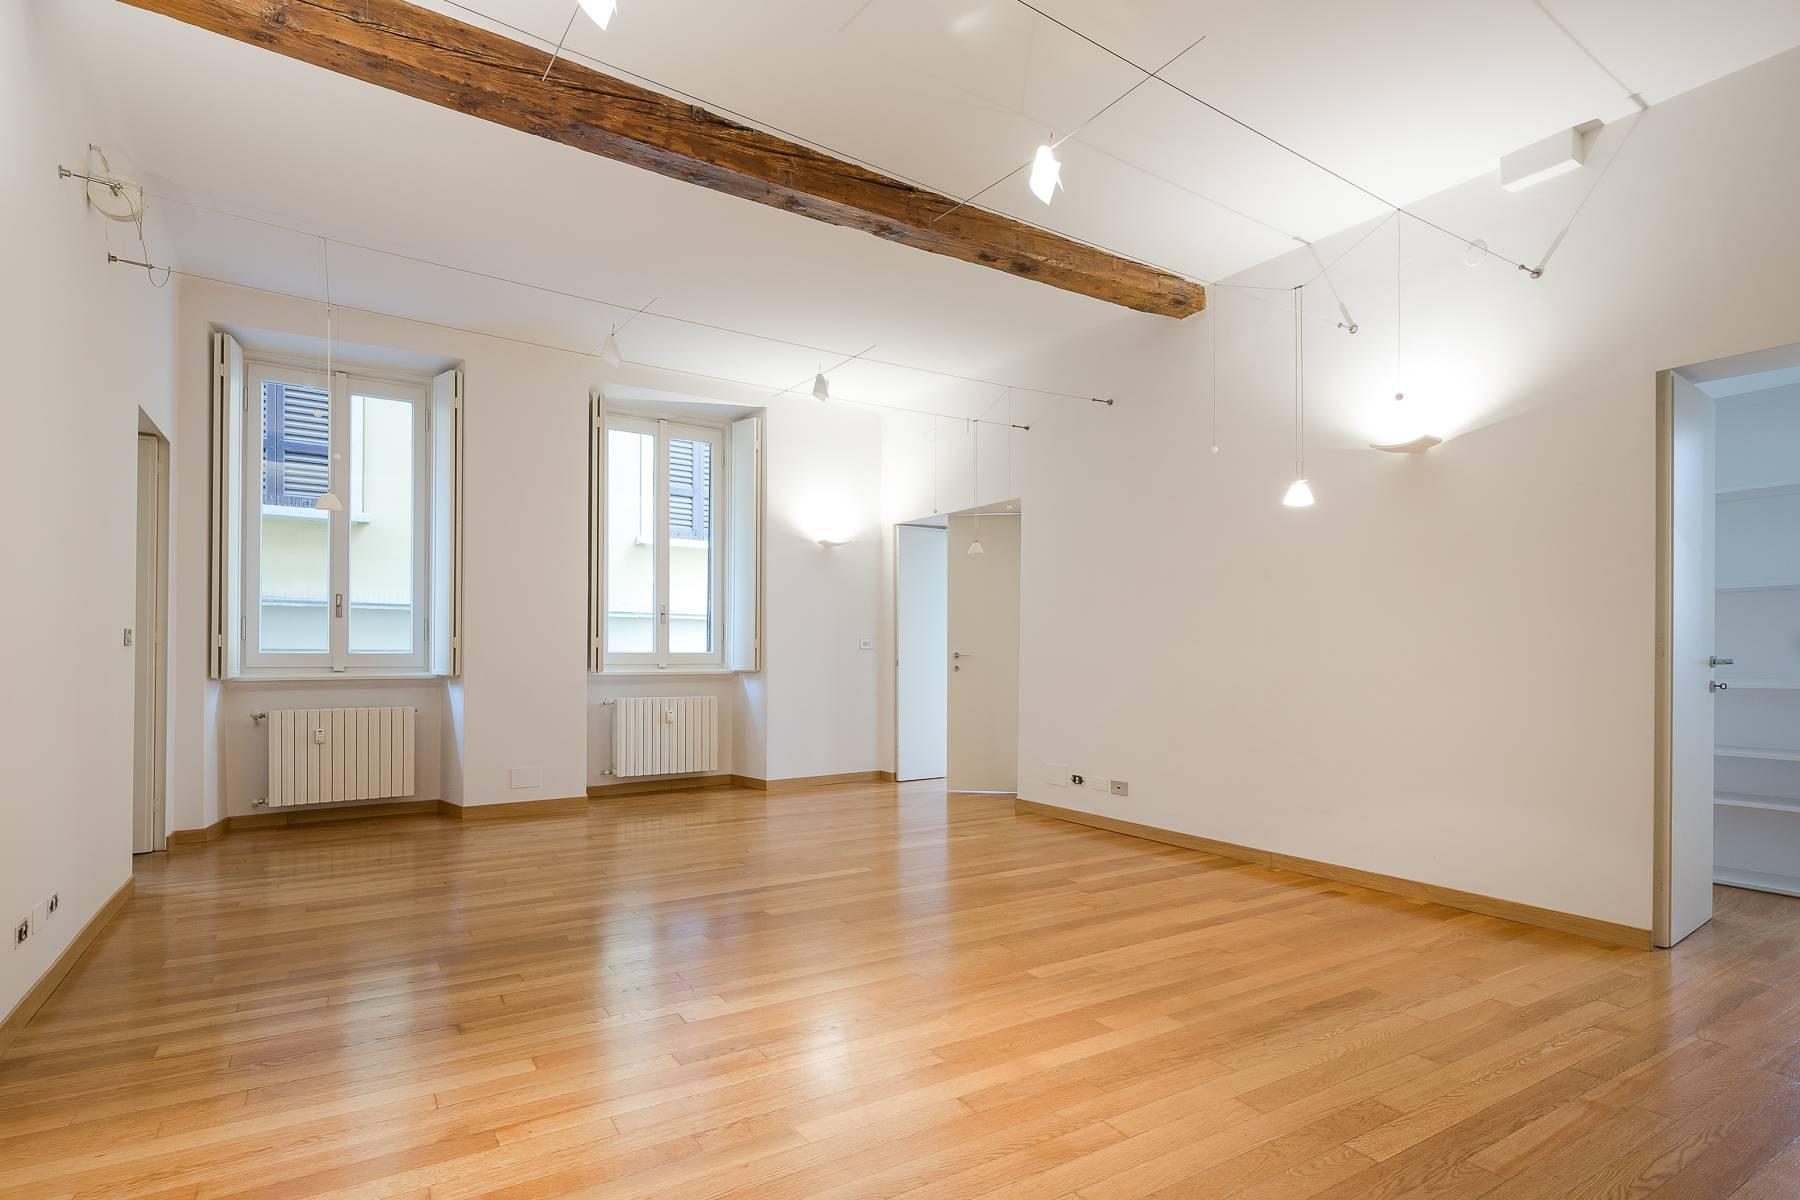 Apartment in an elegant period building located in a prestigious city district - 21